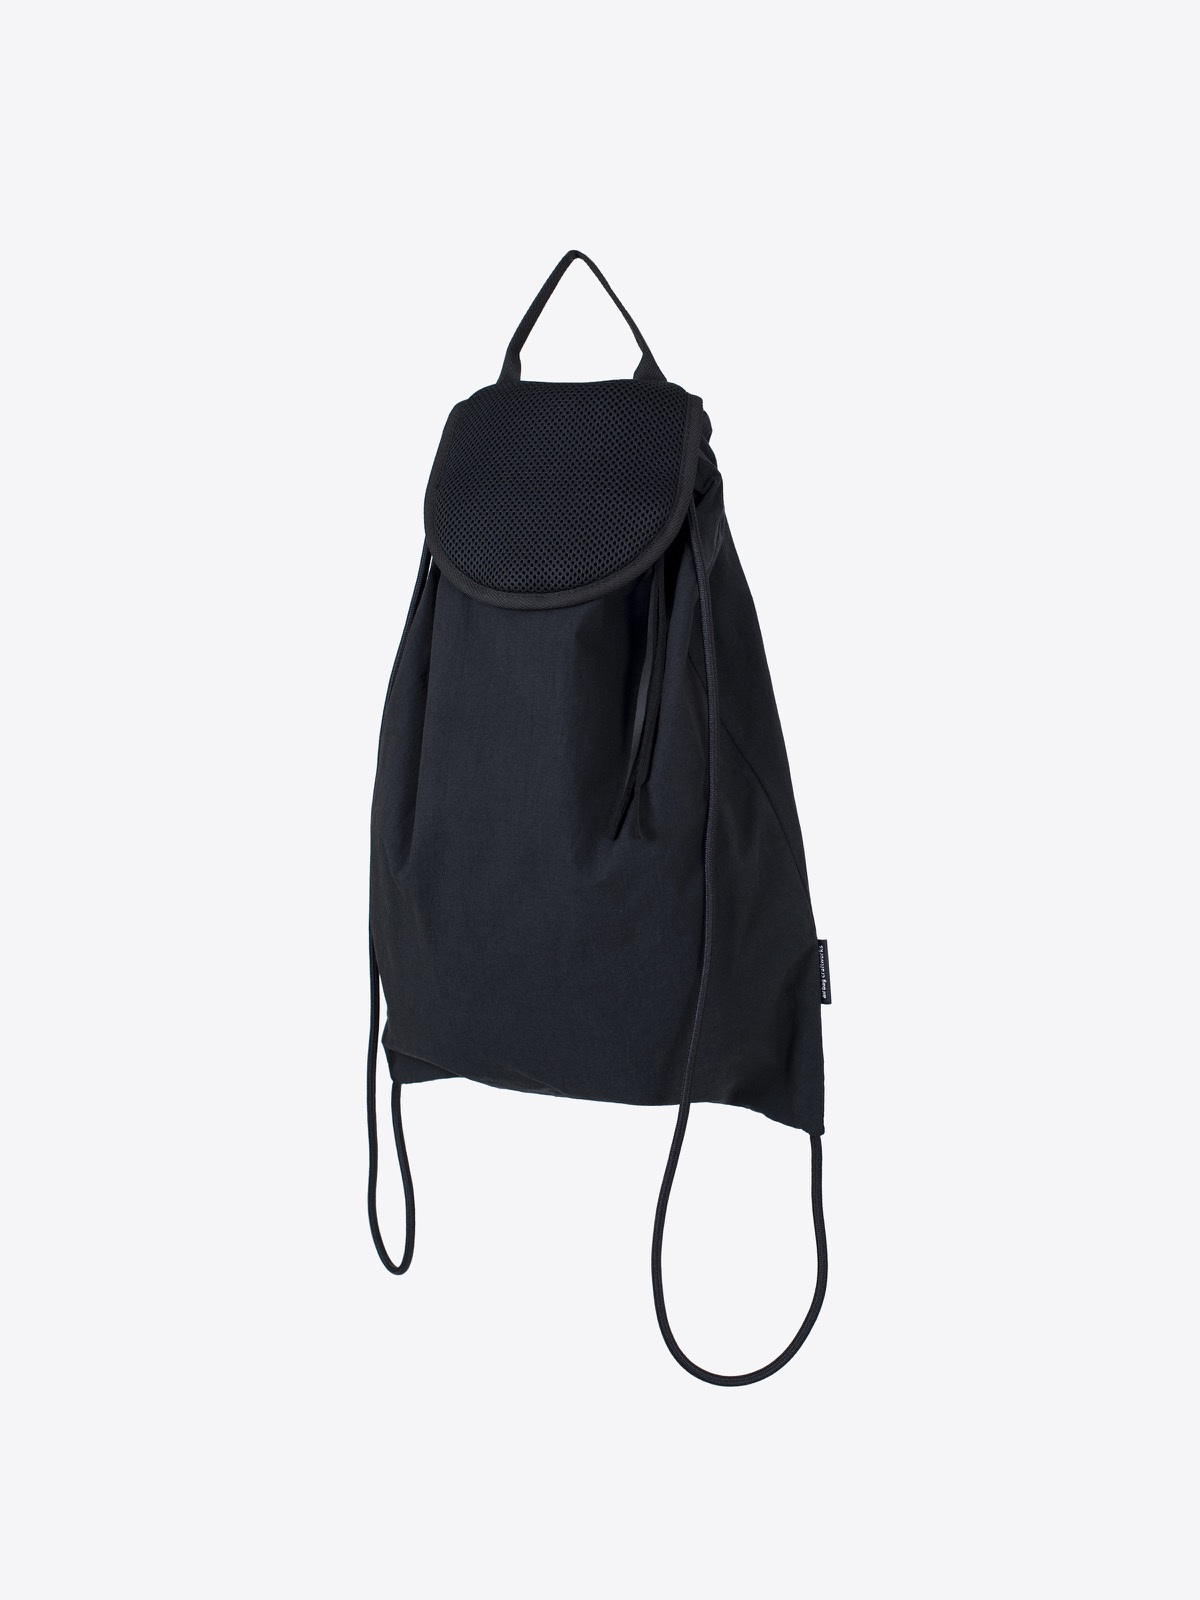 airbag craftworks premium black